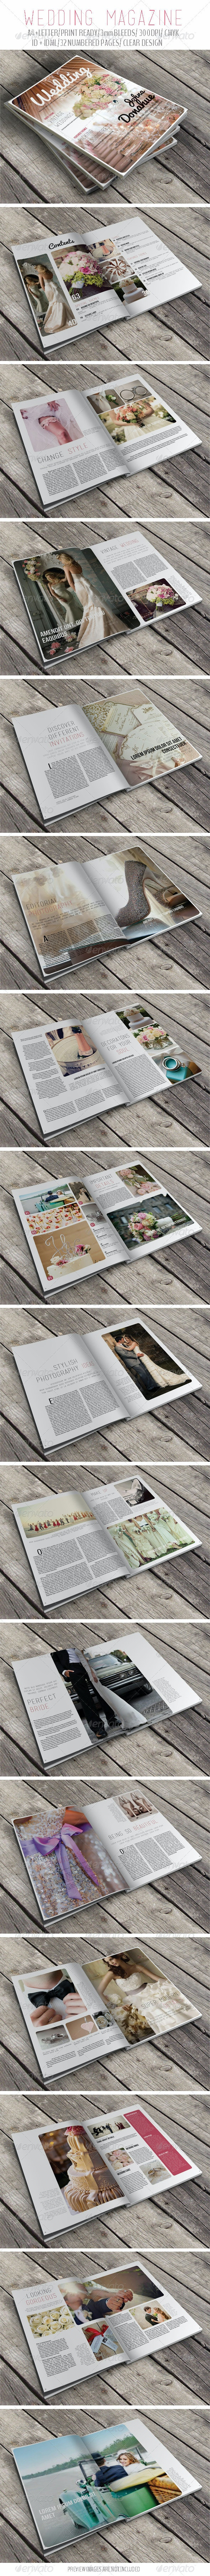 Wedding Magazine - Magazines Print Templates